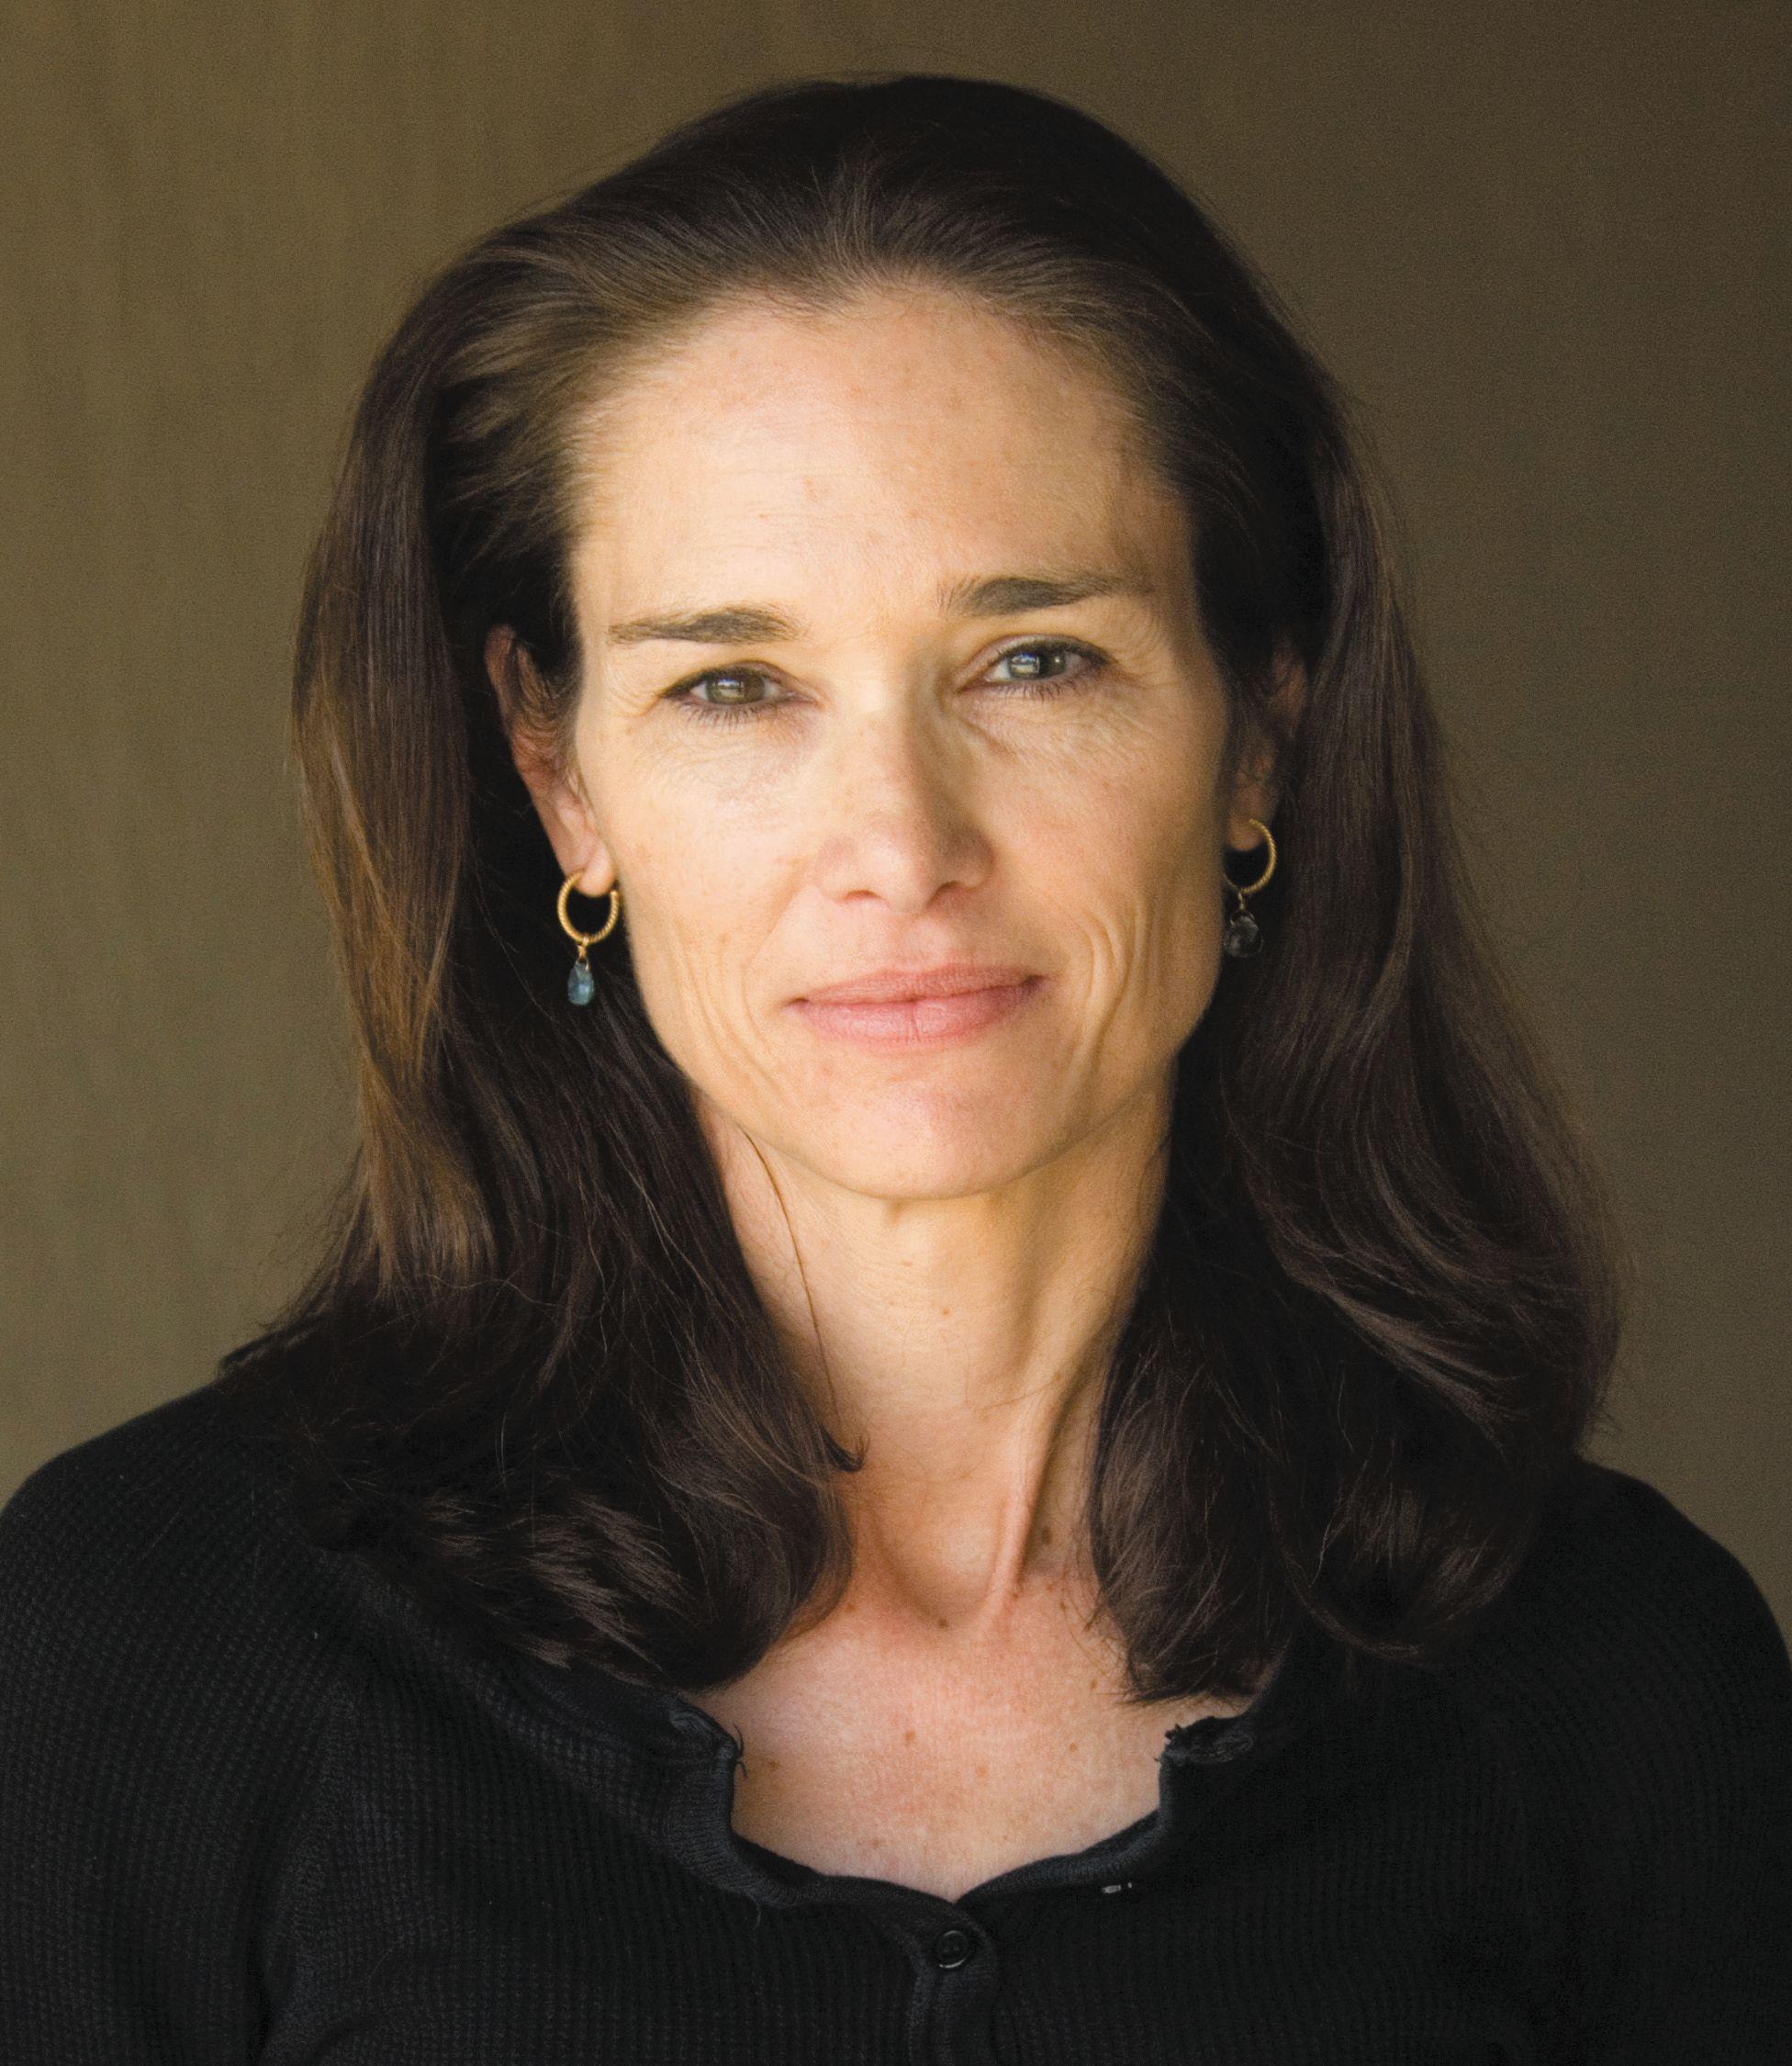 Margaret Bradham Thornton ap_credit Louise Field.JPG